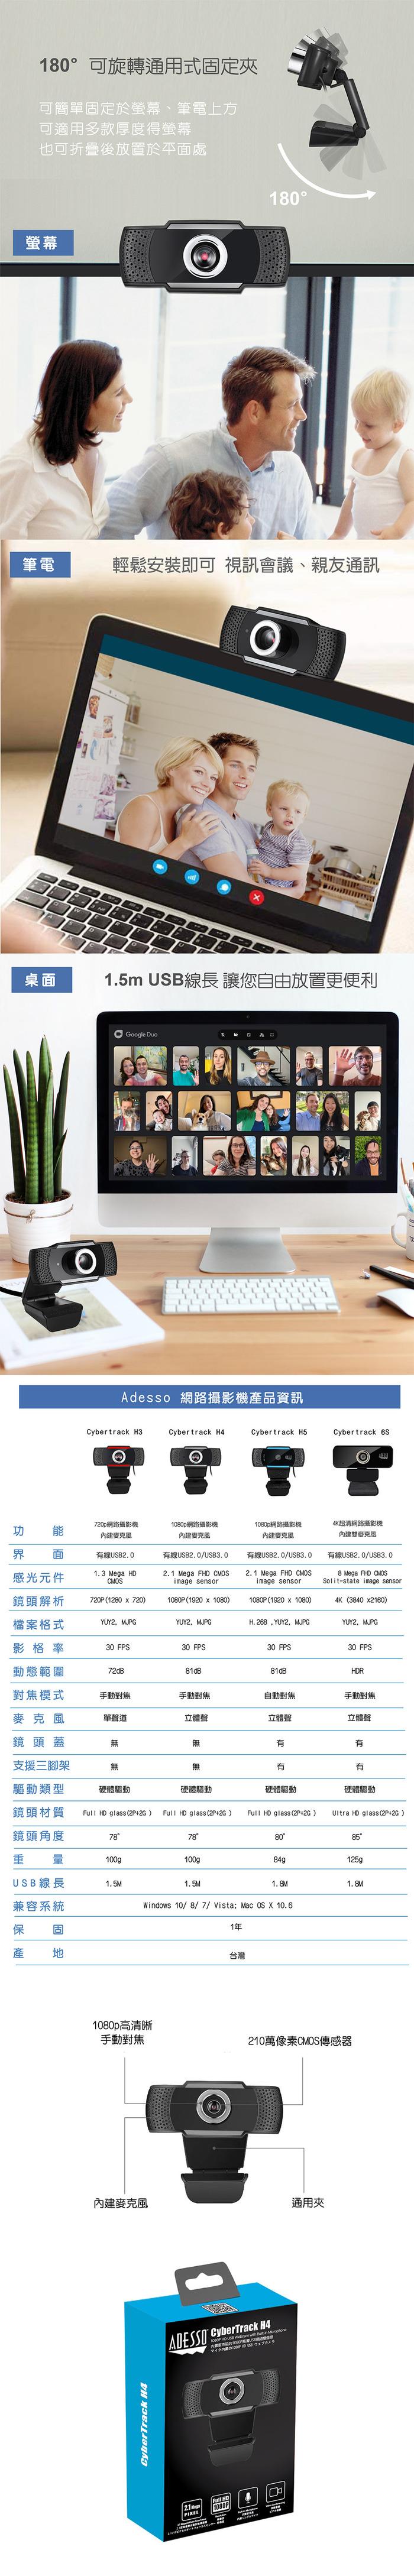 Adesso|視訊鏡頭/網路攝影機1080P HD USB隨插即用 內建麥克風 台灣製造 (CyberTrack H4)